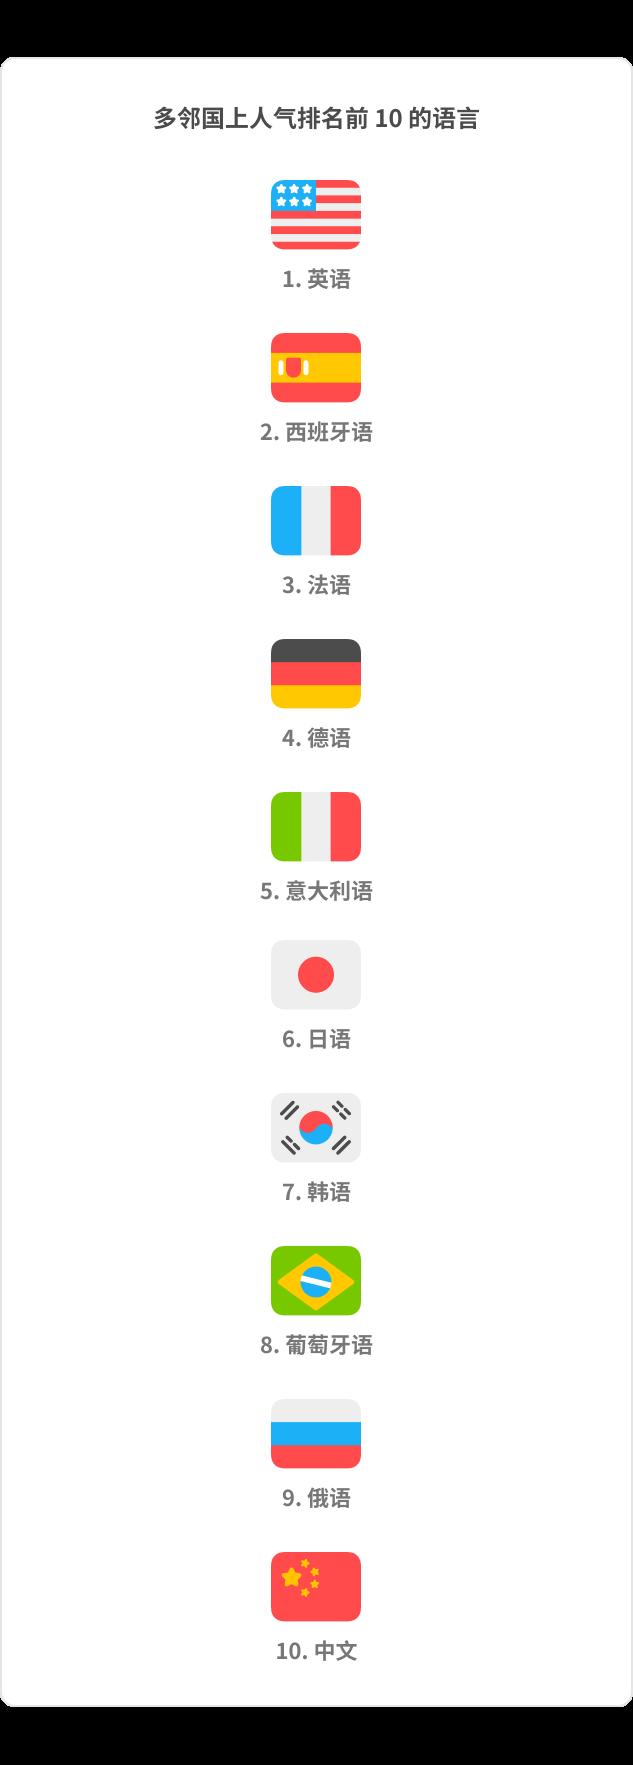 DLR_China_Top10_1